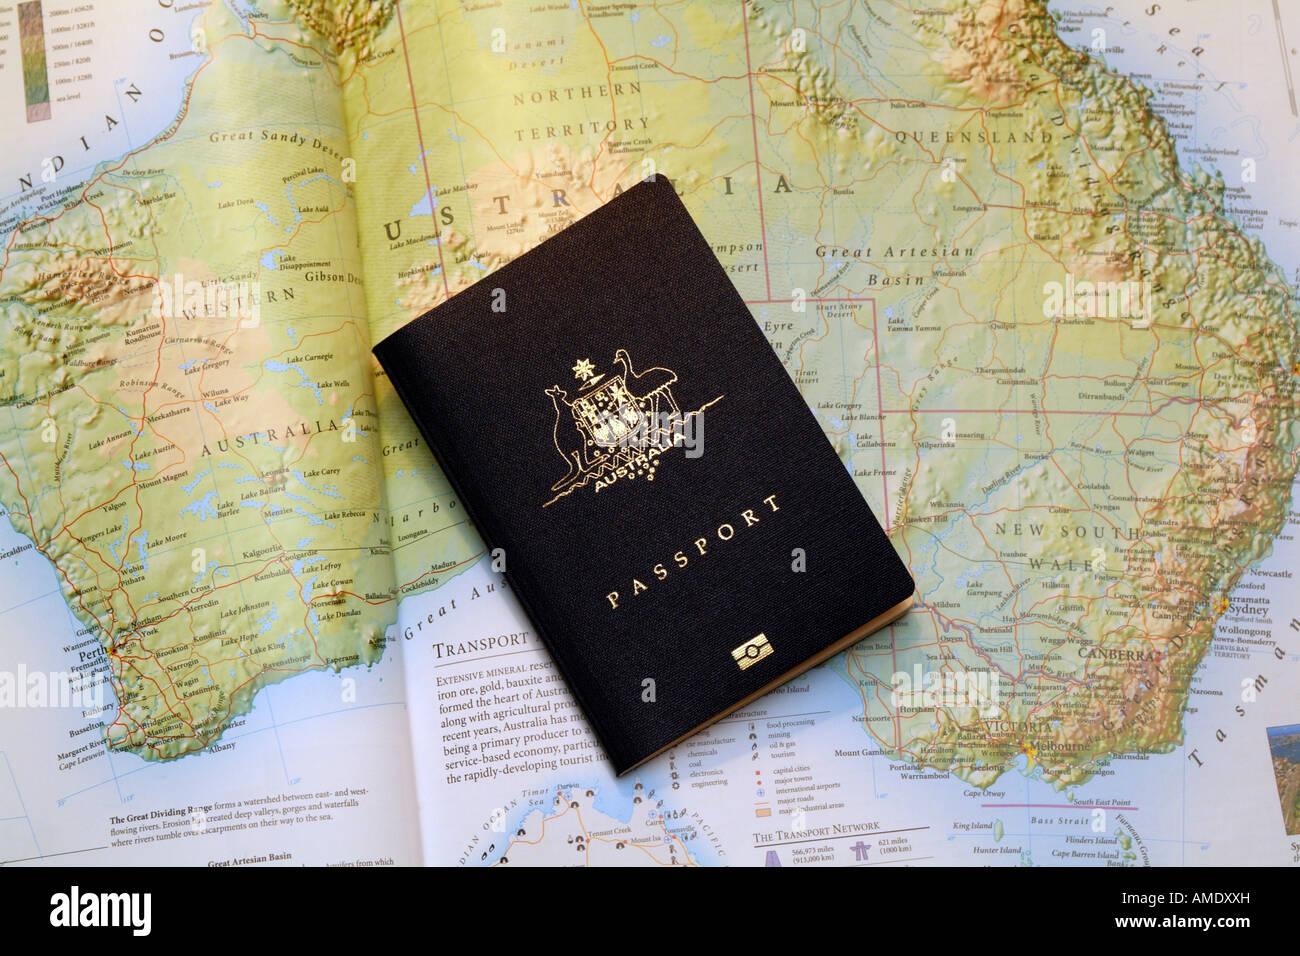 Australian Passport New Version and Map of Australia - Stock Image